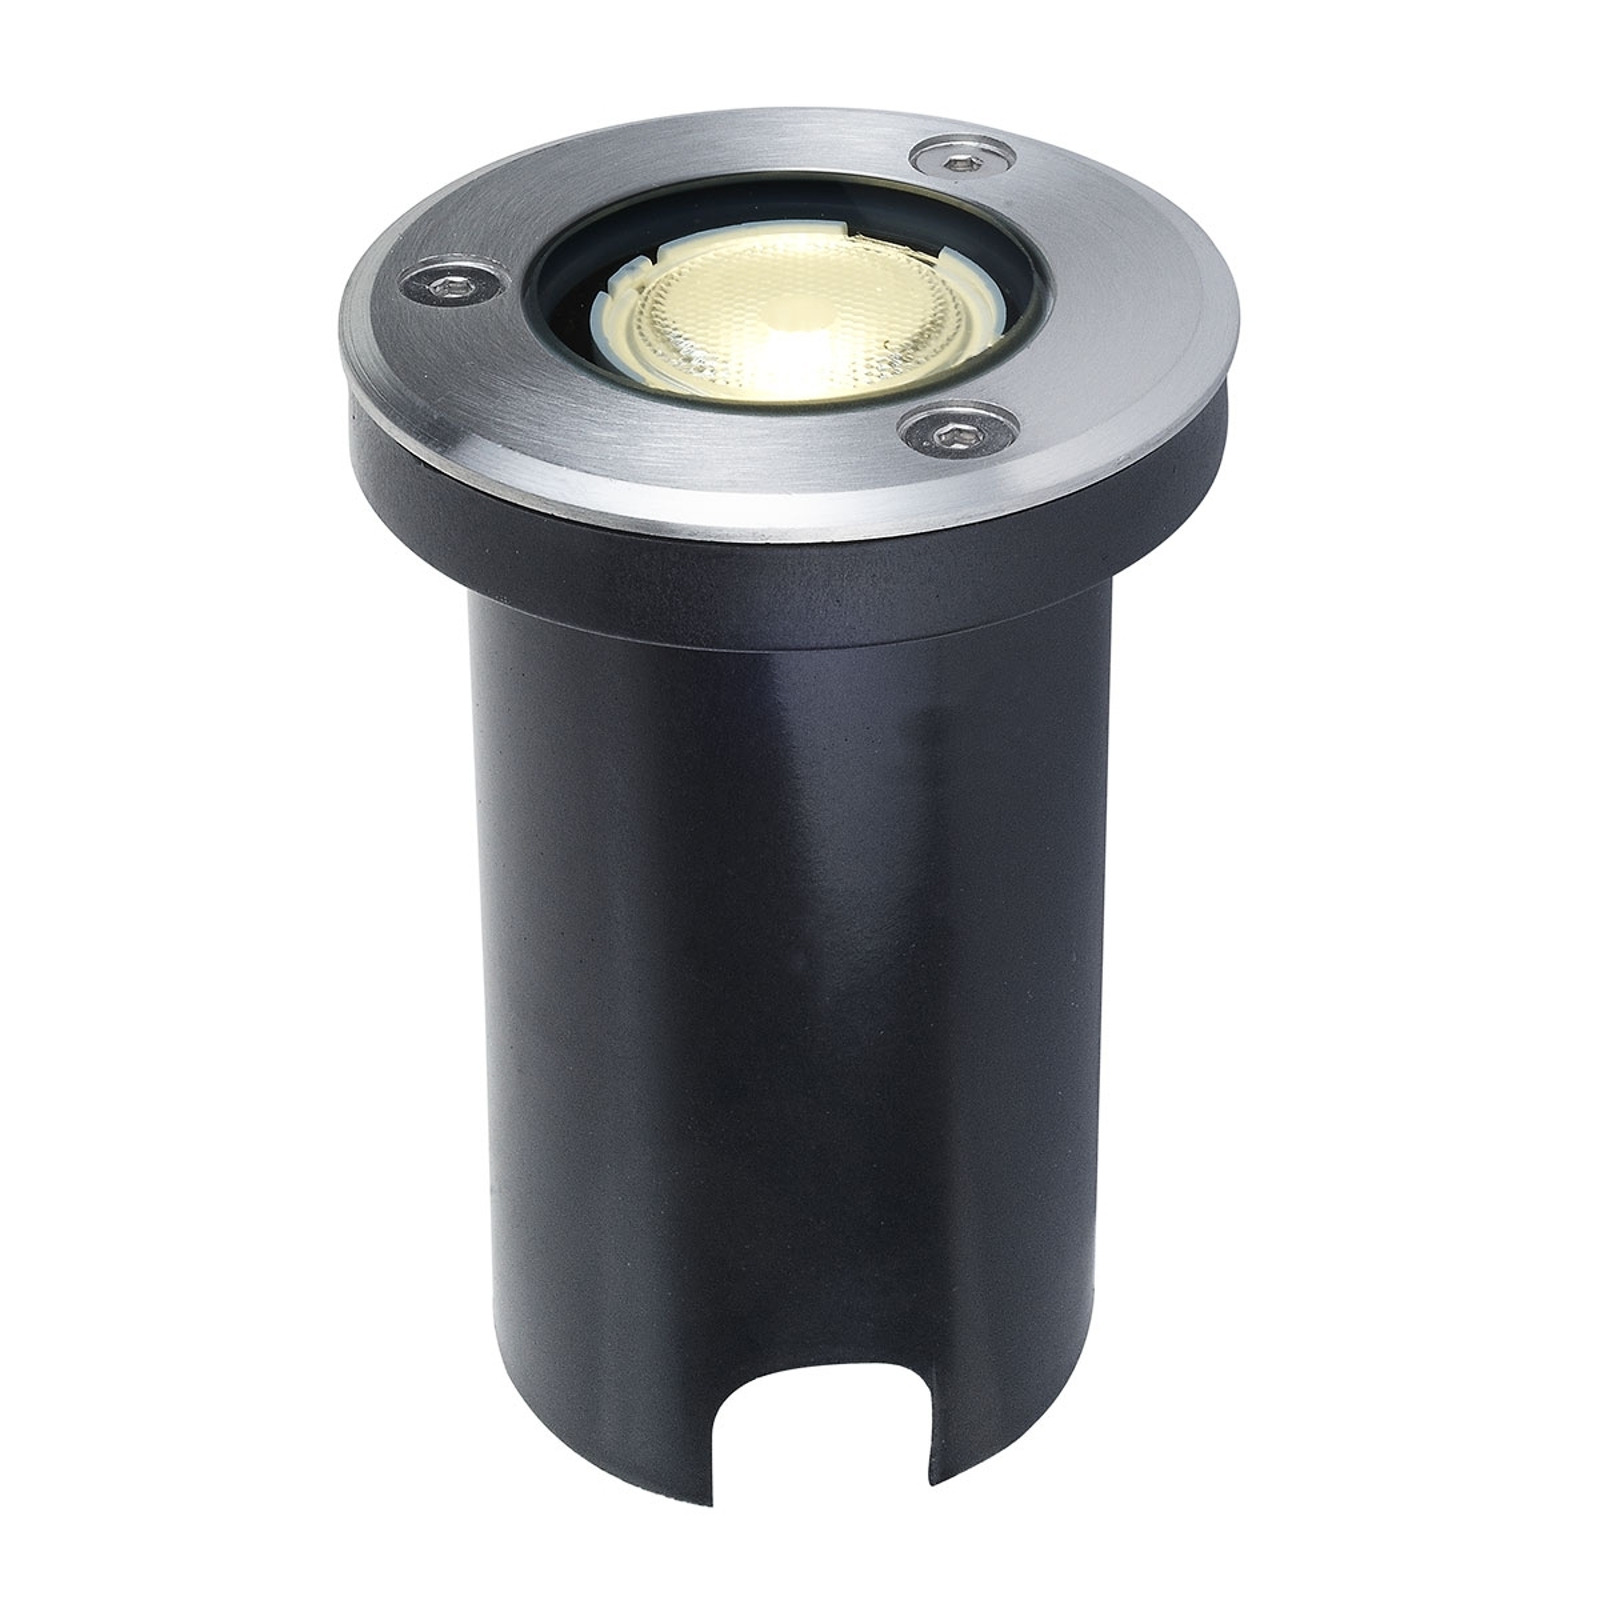 LED-gulvinnbyggingslampe Kenan, rustfritt stål